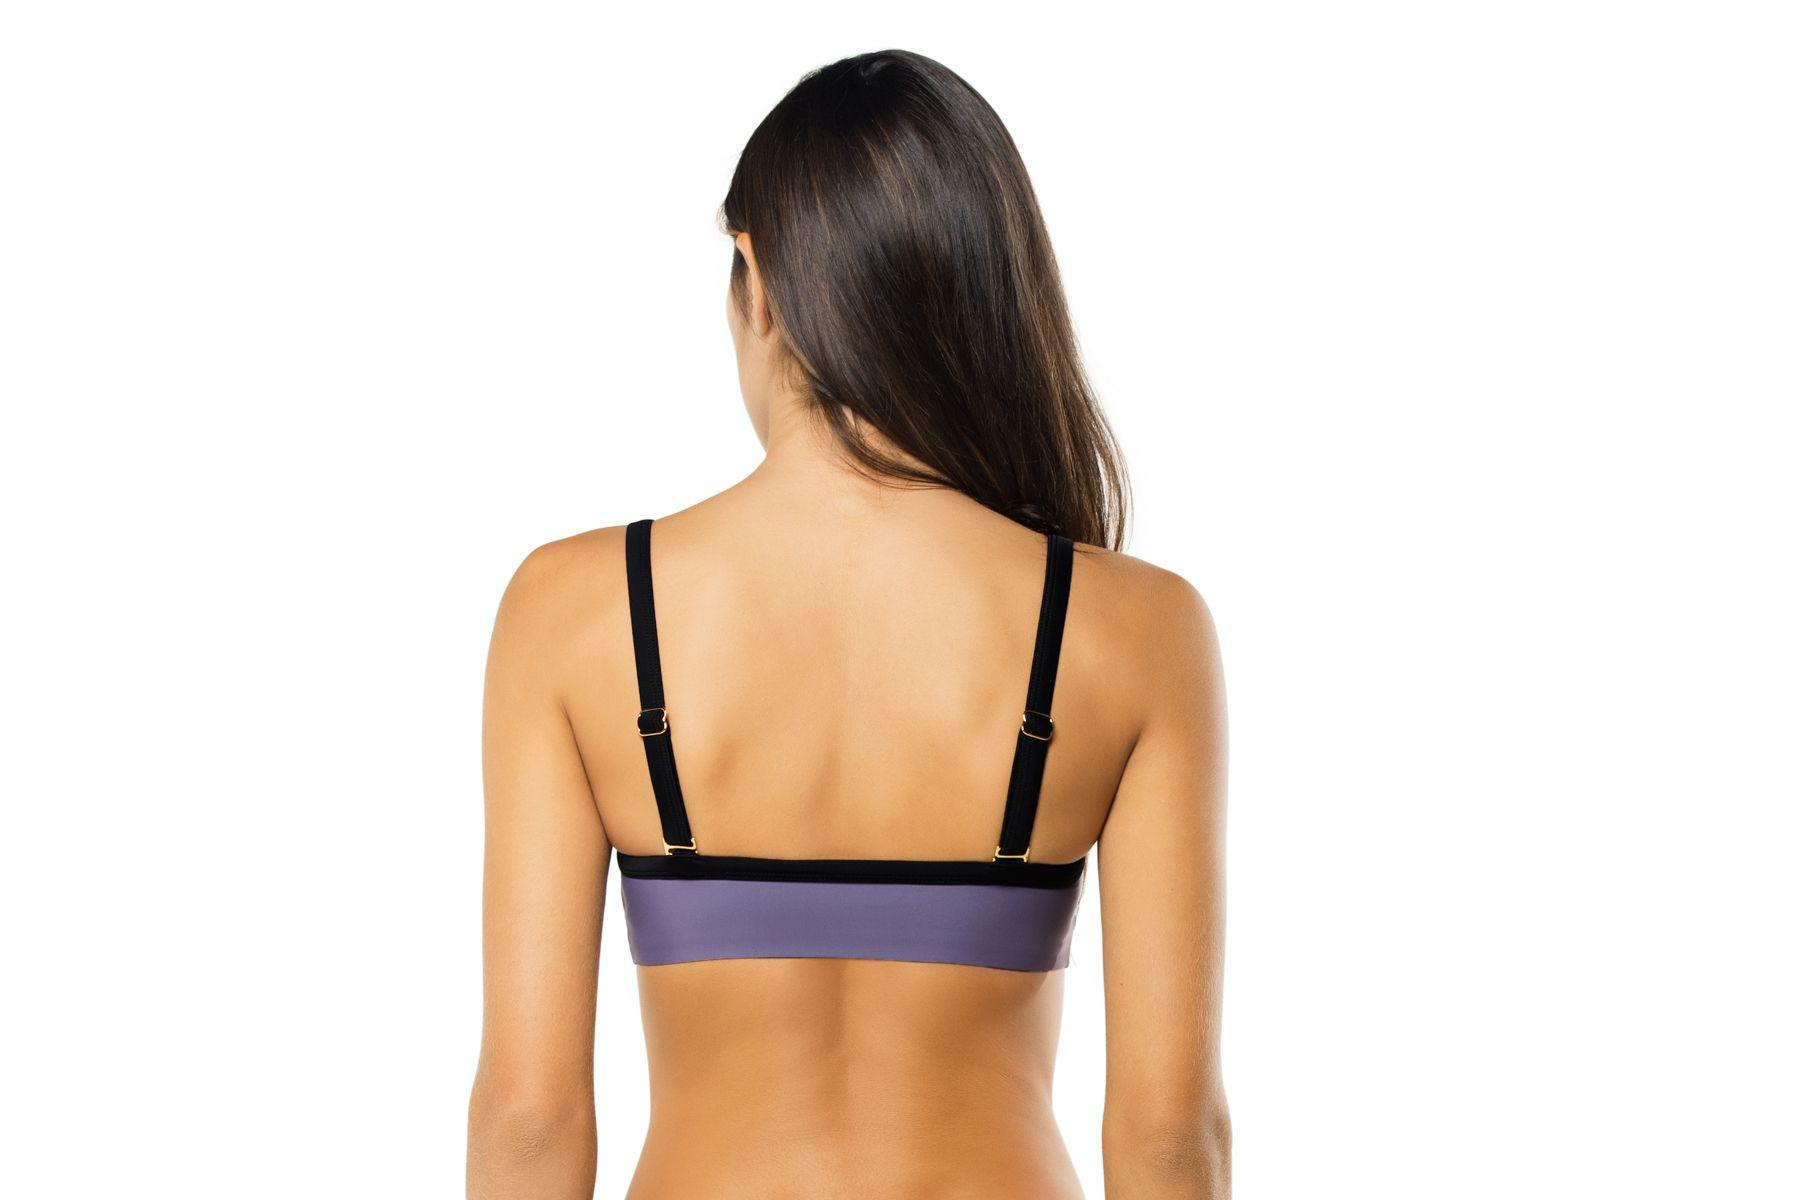 54586ff7586ec Lyst - Pilyq Amethyst Color Block Halter Swim Top in Purple